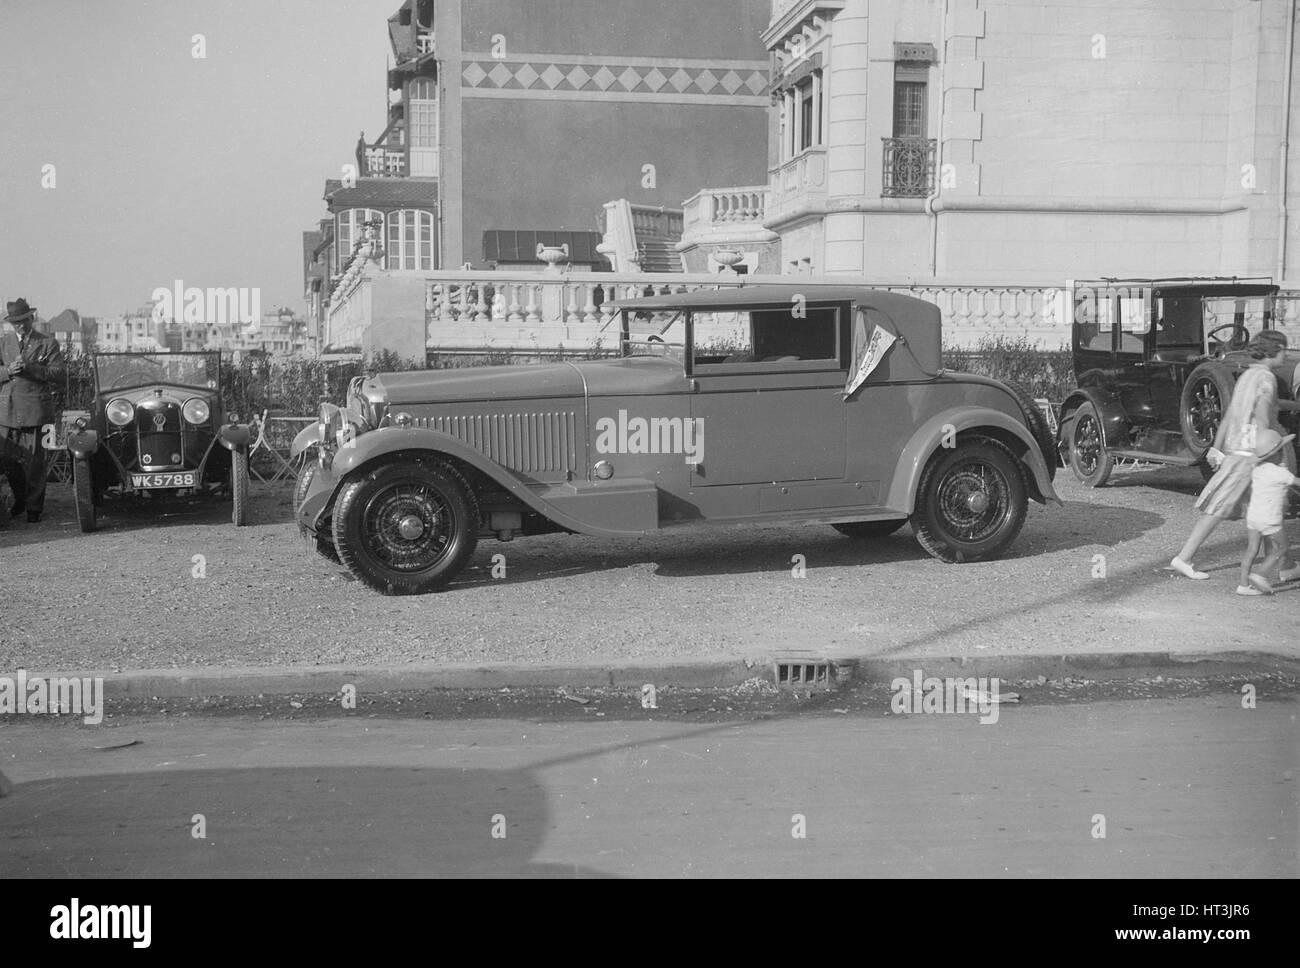 Minerva 2-door coupe at Boulogne Motor Week, France, 1928. Artist: Bill Brunell. - Stock Image